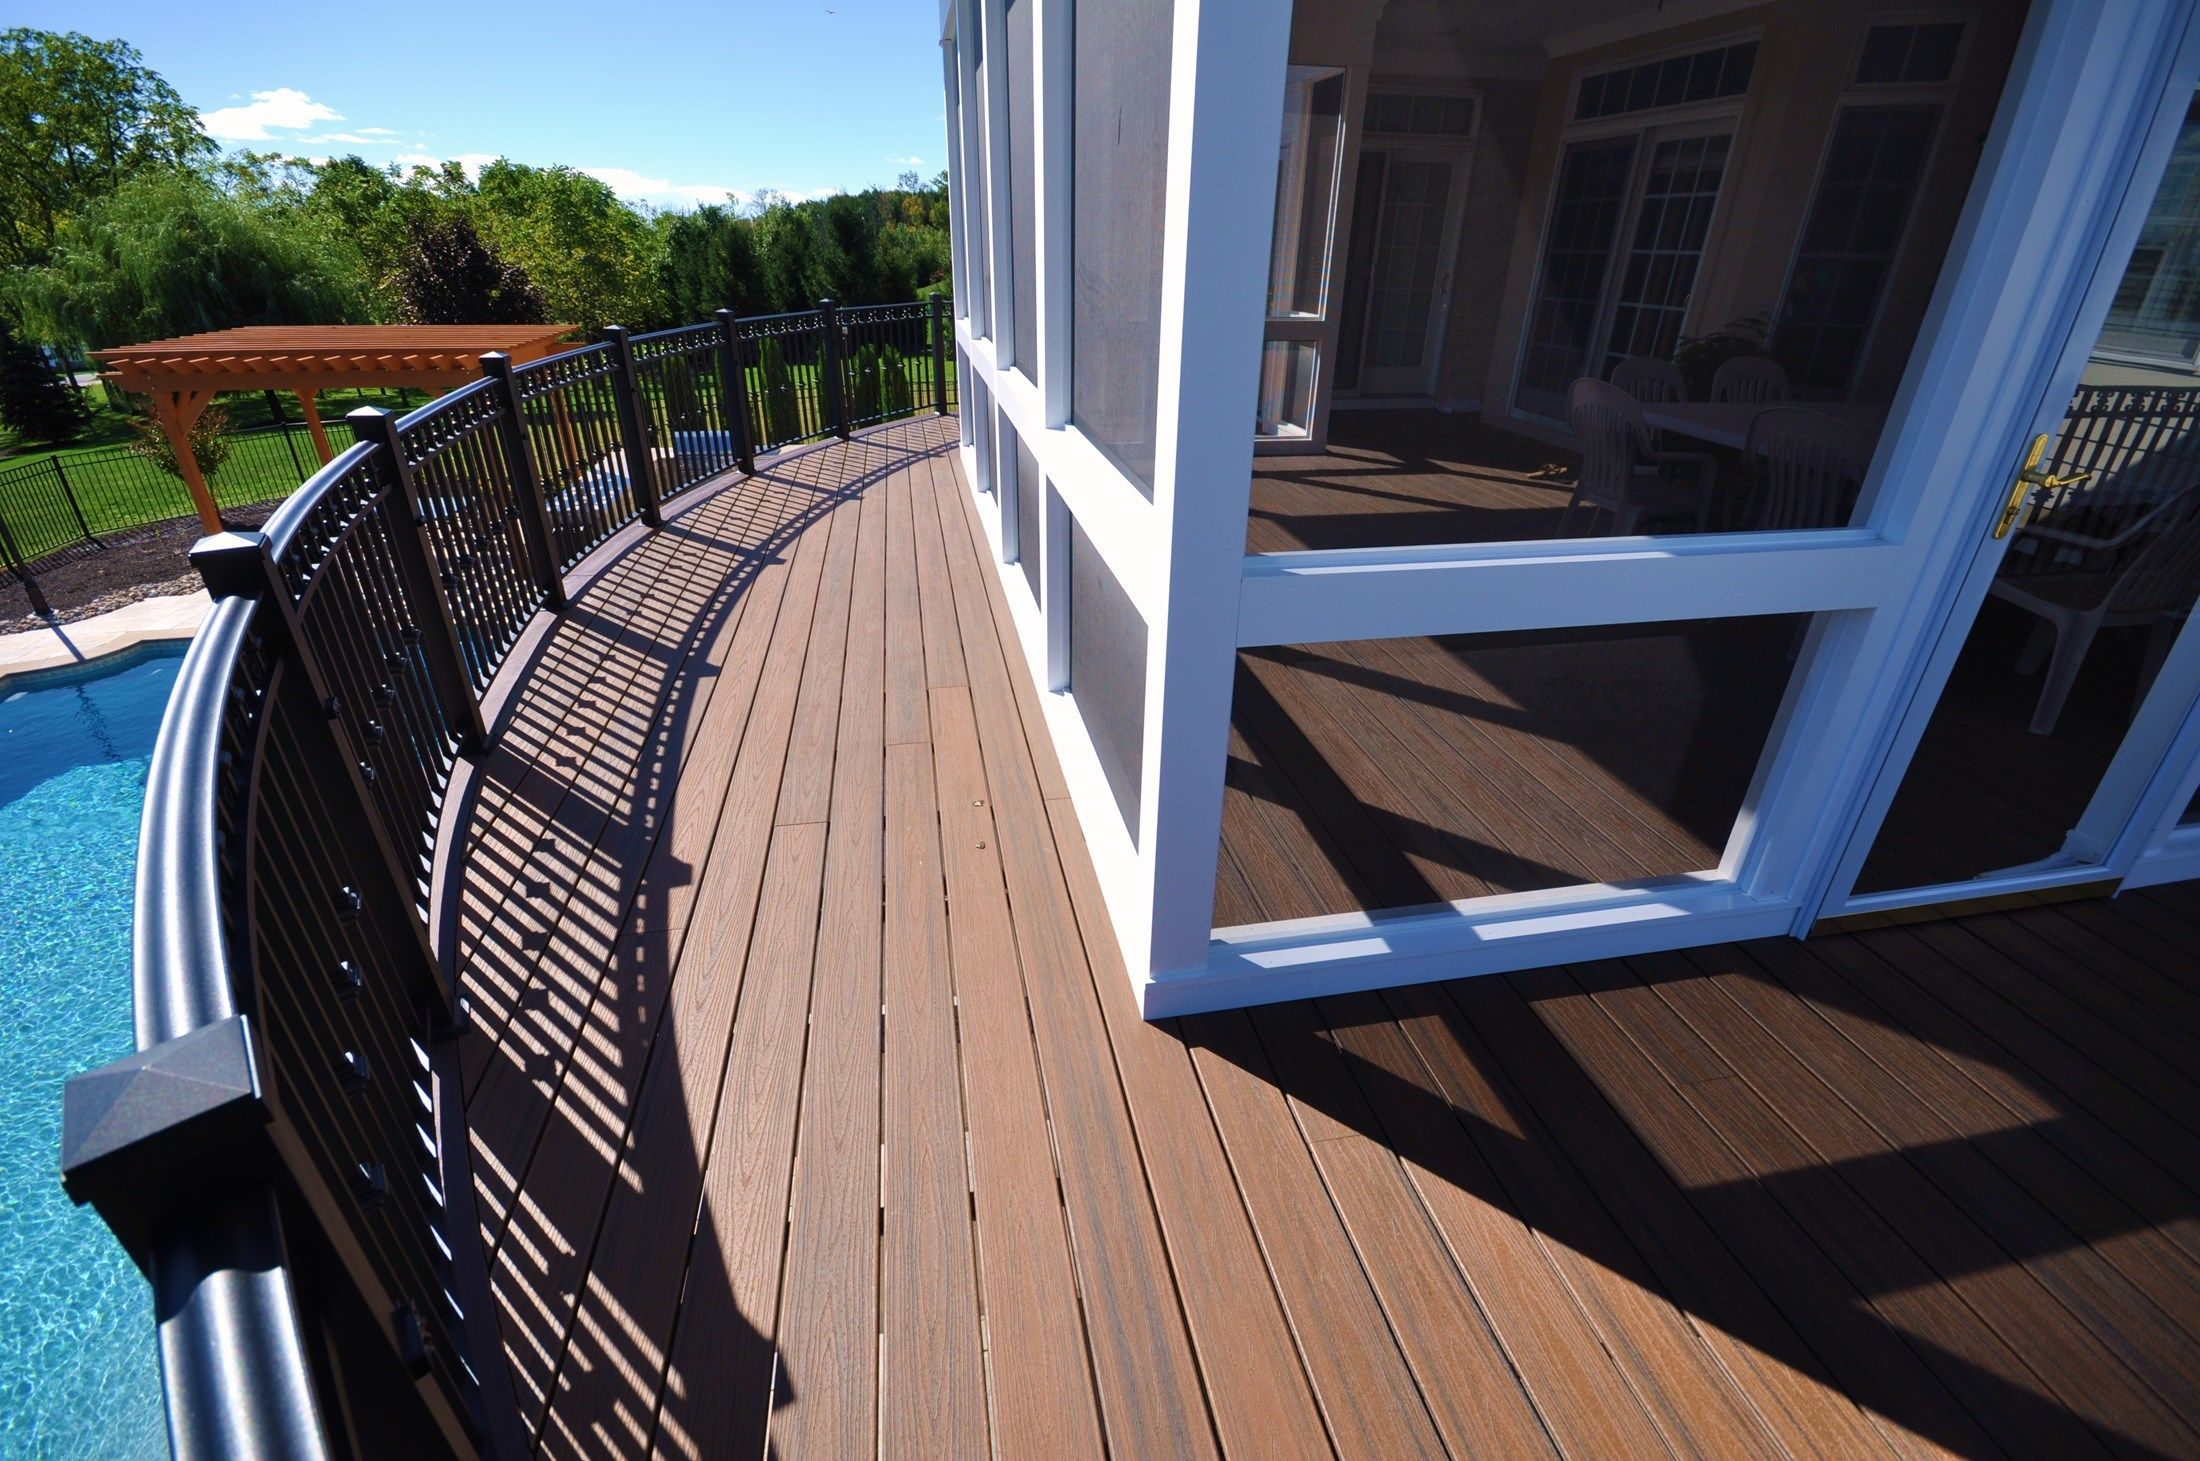 Viradia deck - Picture 1338